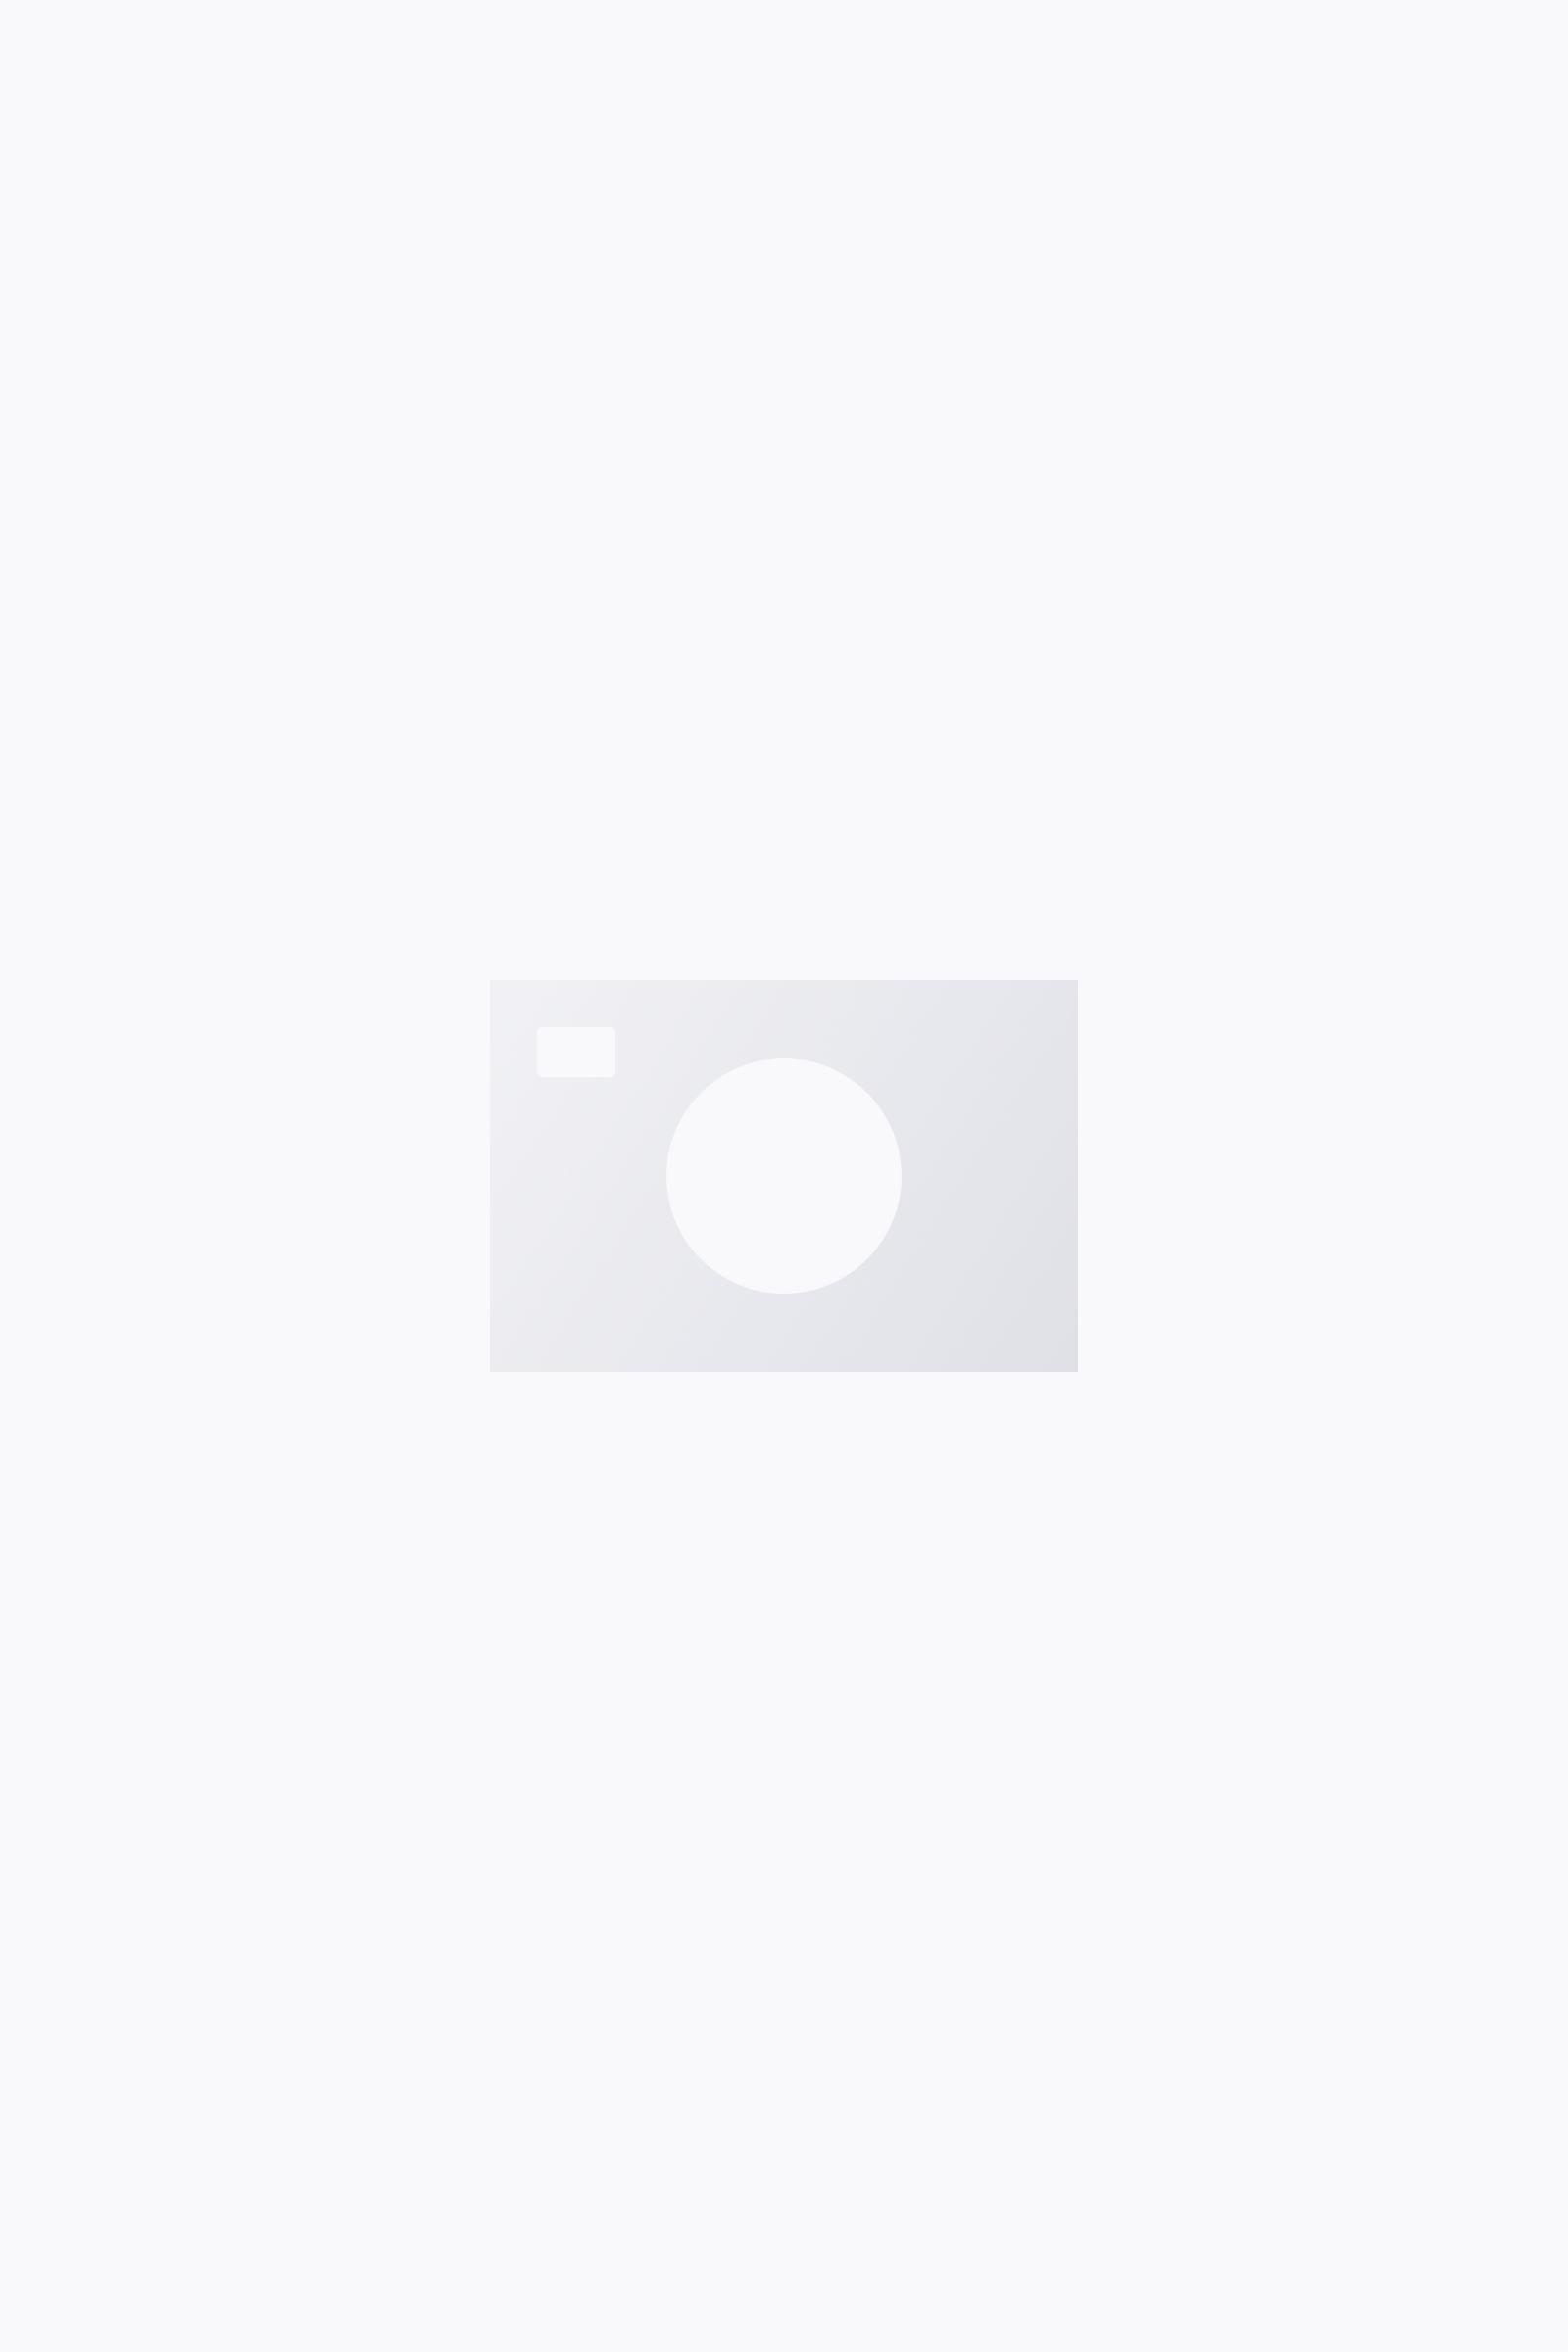 COS SWEAT SHORTS,washed grey